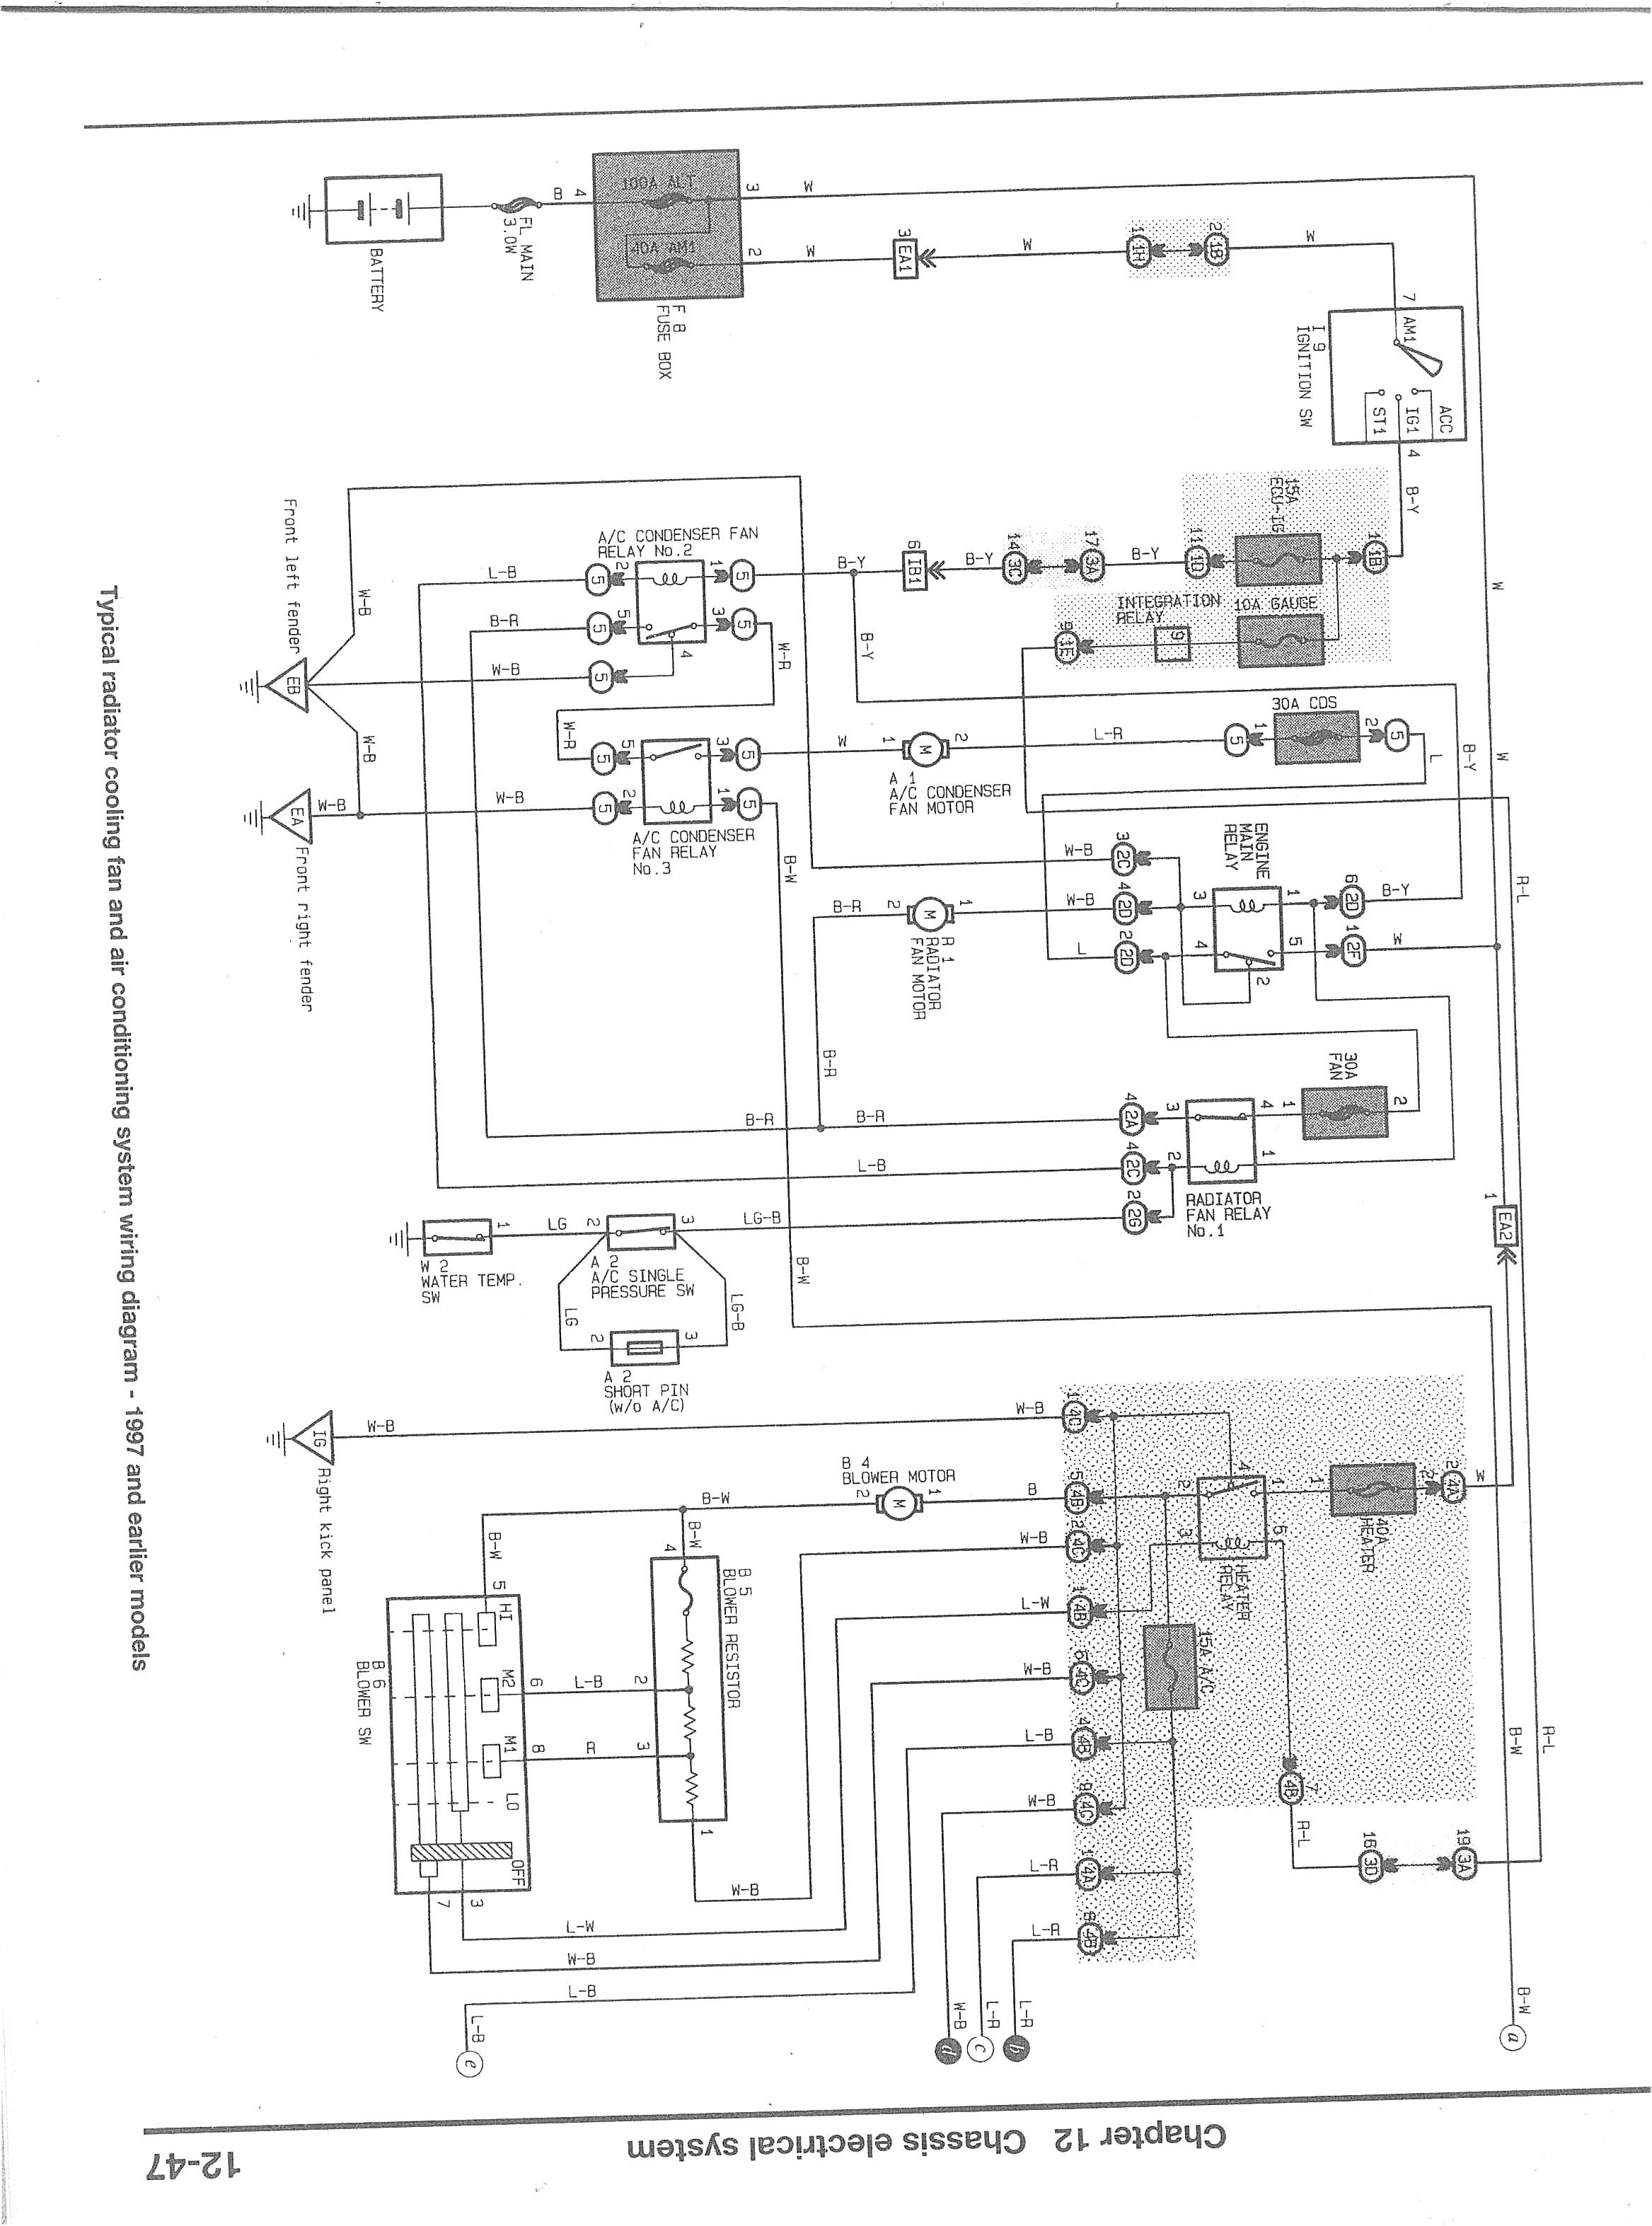 Goodman Phk024-1f Wiring Diagrams Goodman Air Handler Wiring Diagram Sample Of Goodman Phk024-1f Wiring Diagrams